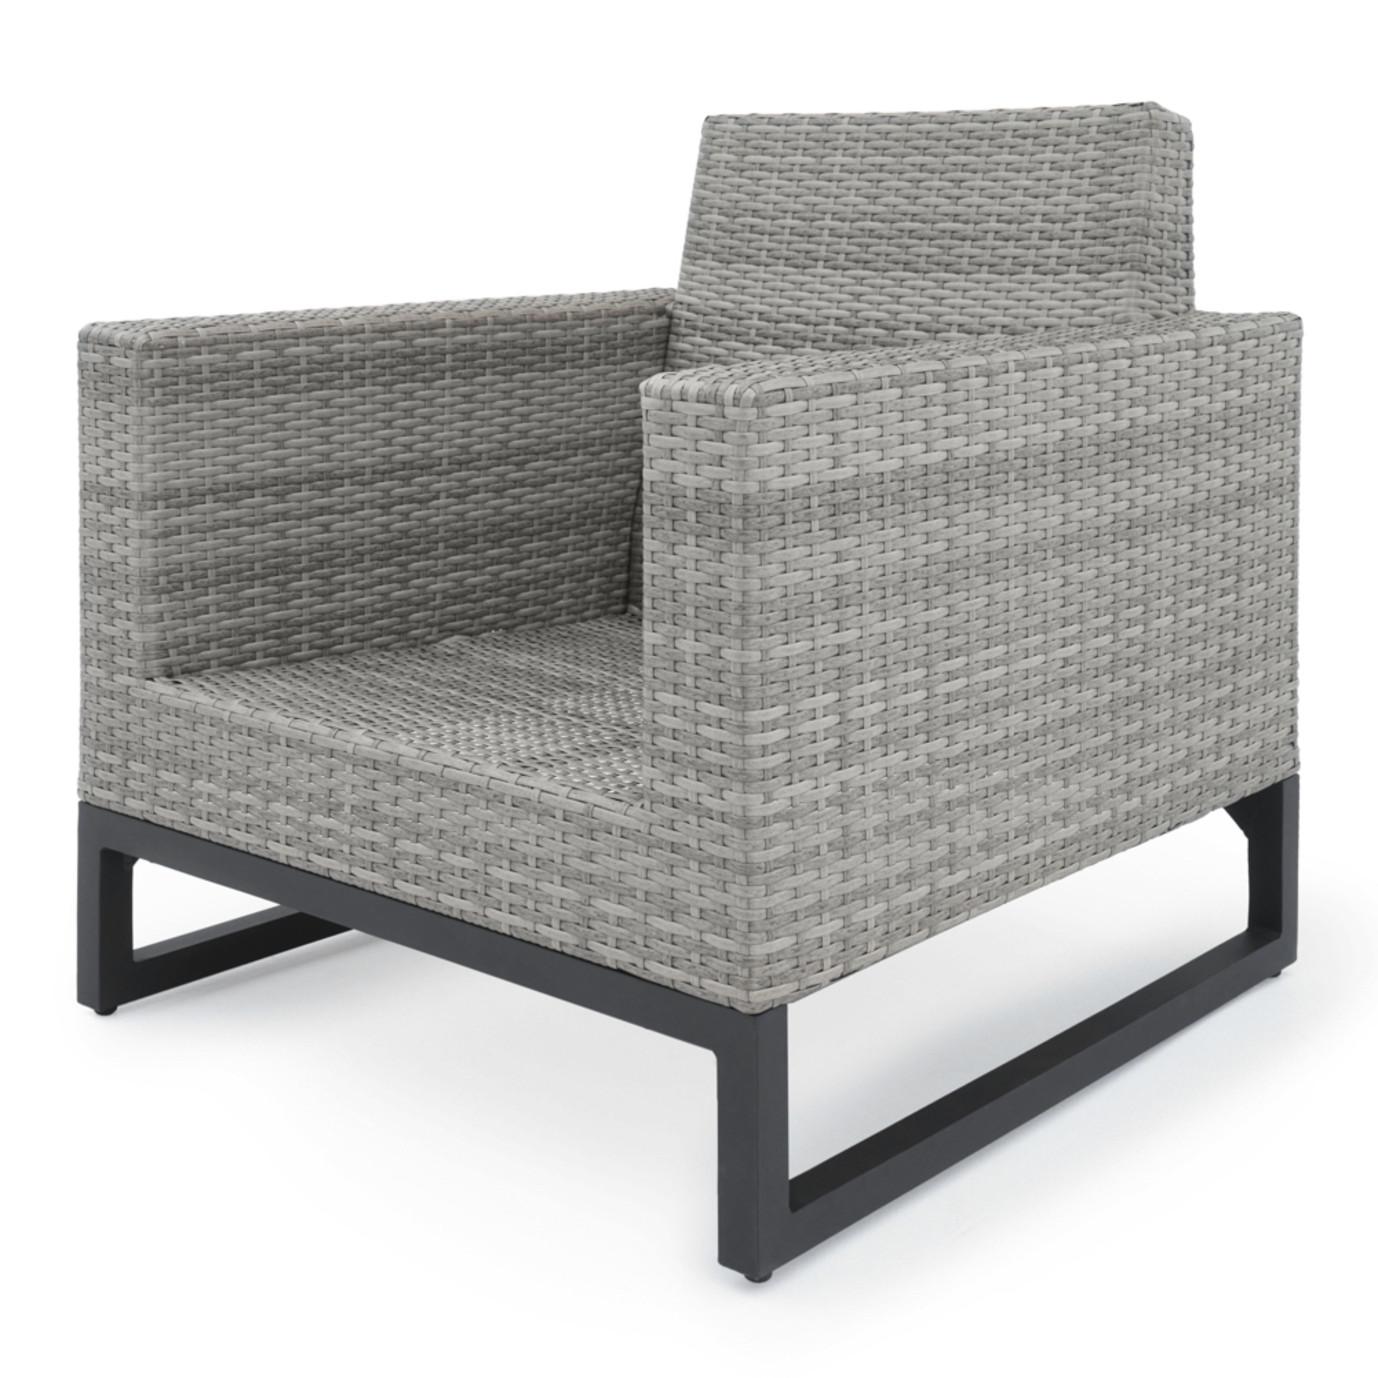 Milo™ Gray 4pc Seating Set - Navy Blue